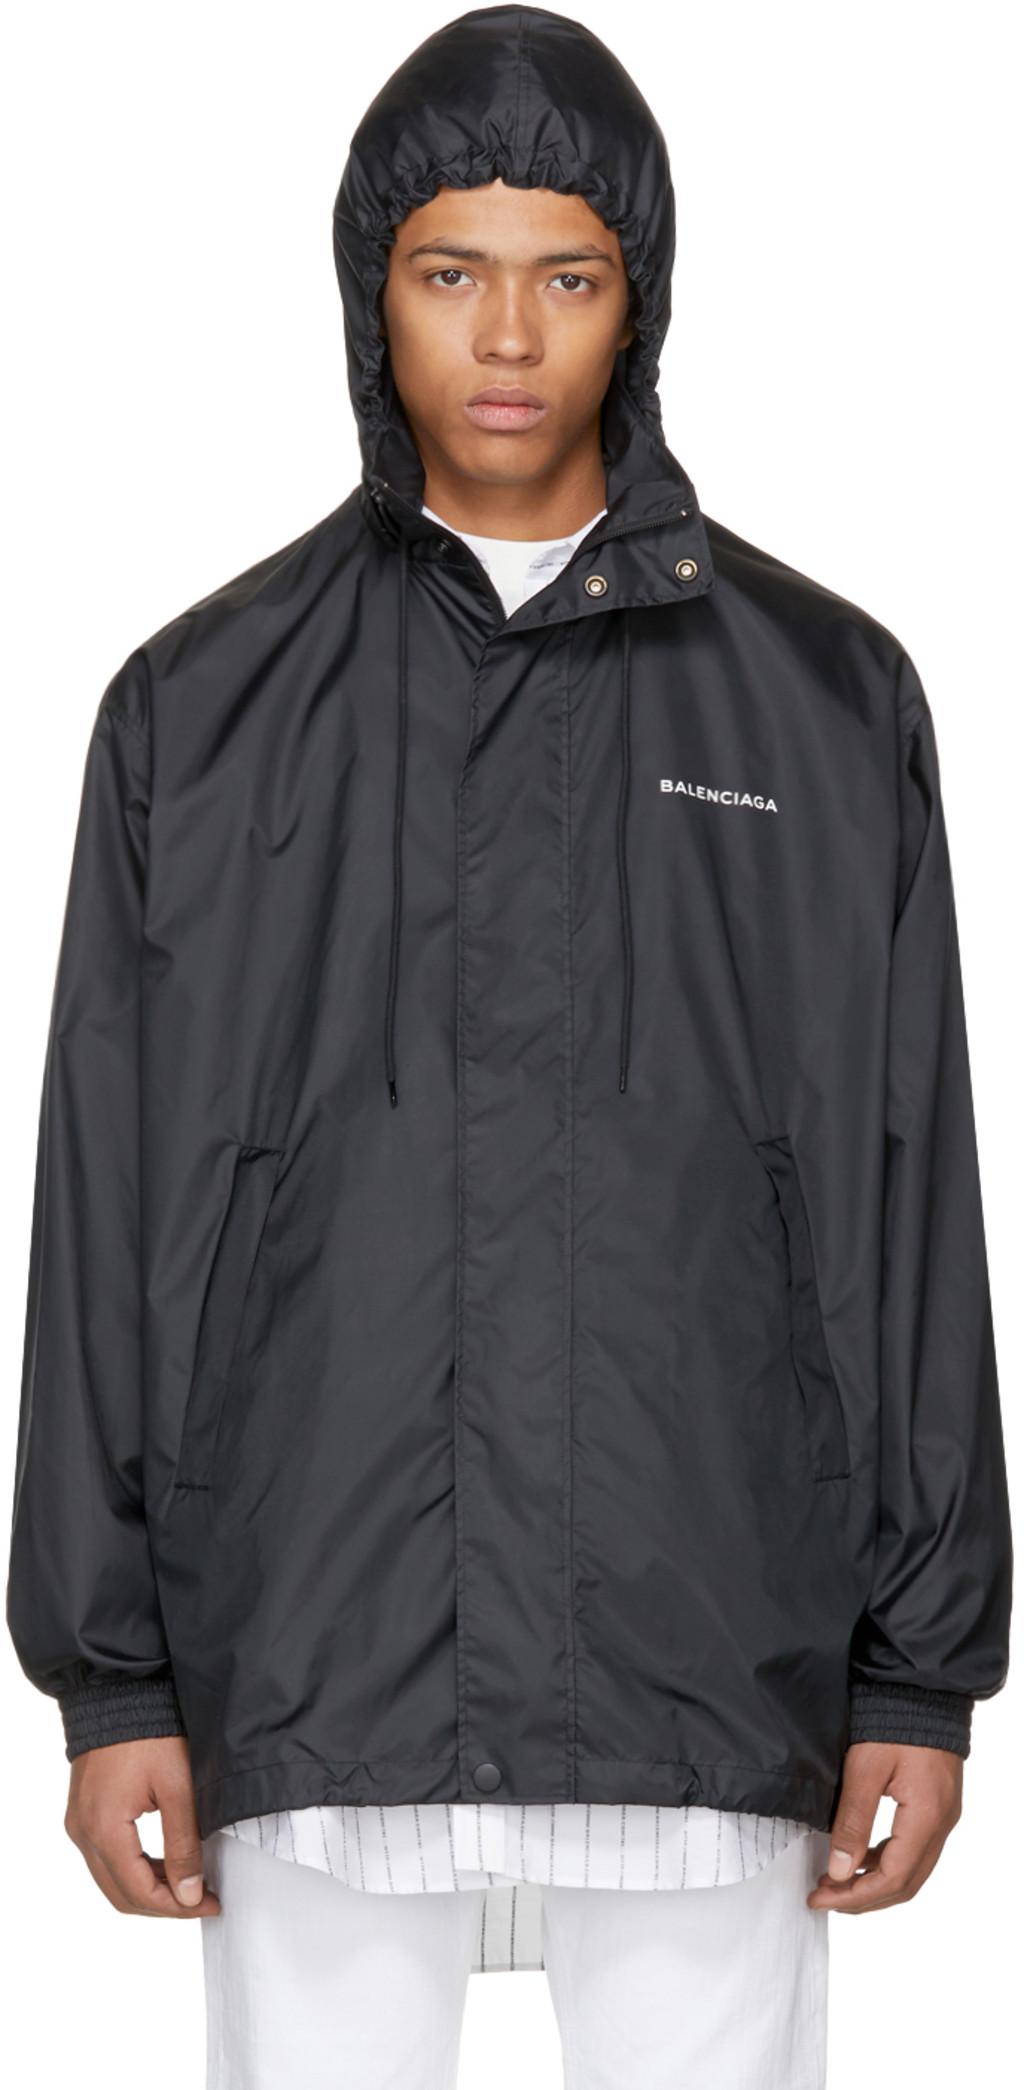 balenciaga hoodie mens navy